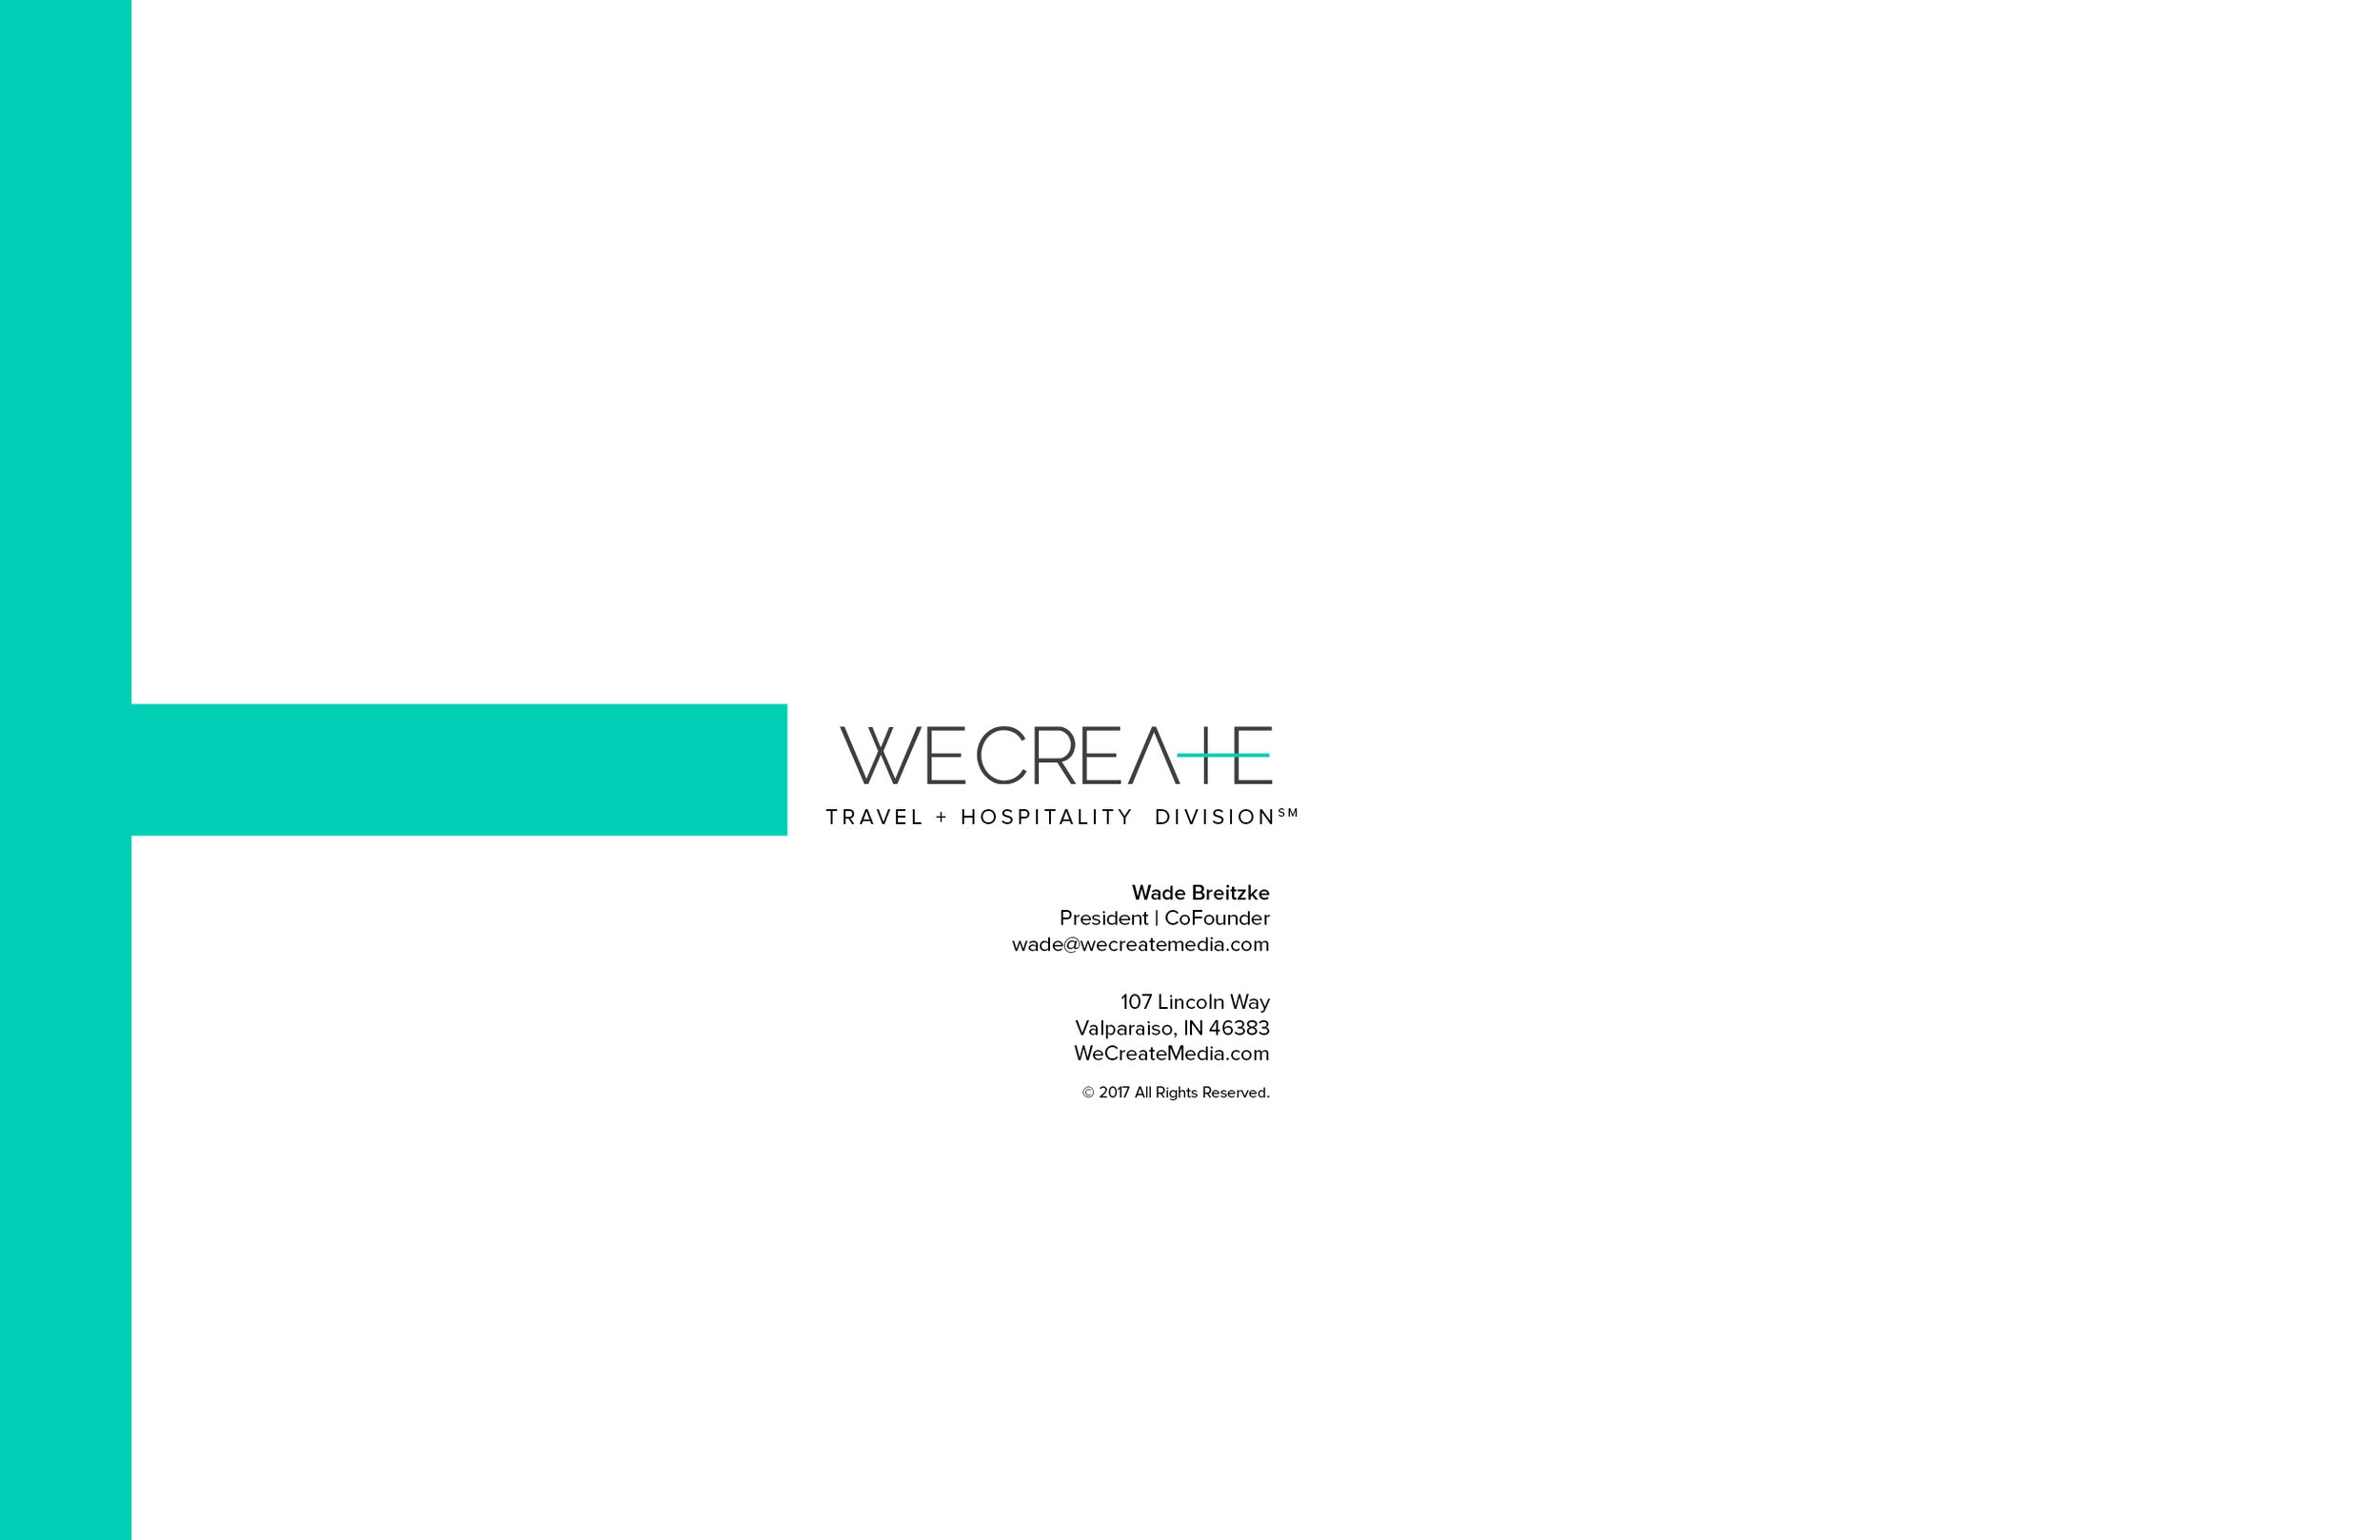 WeCreate-Hosp Division63.jpg